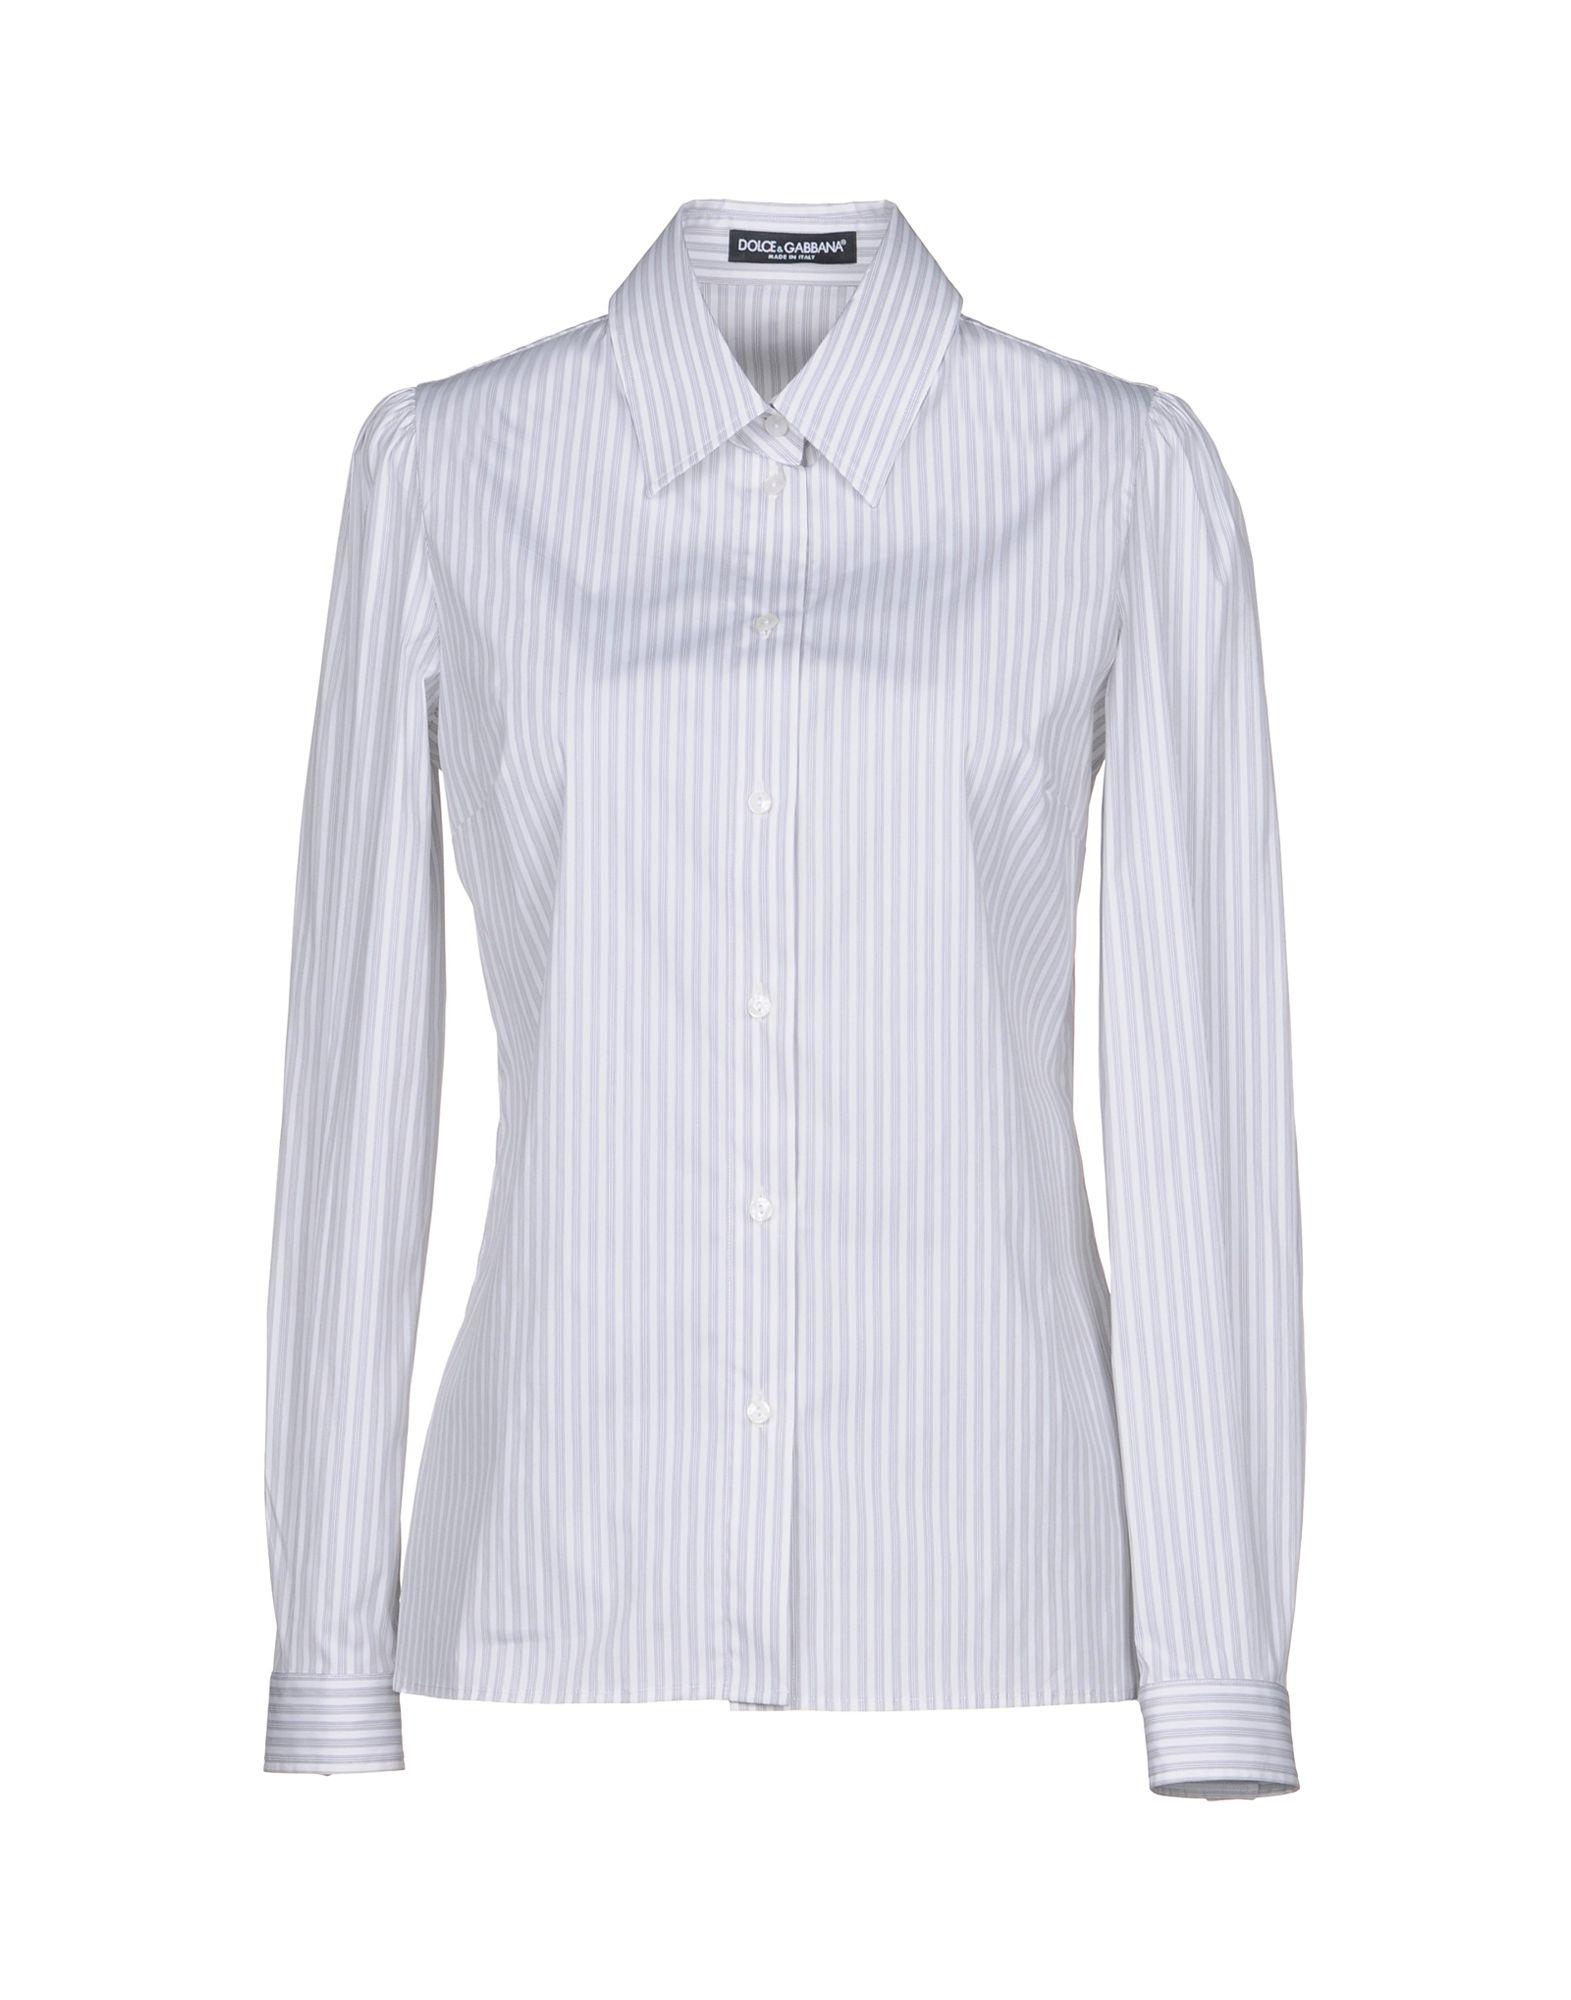 Camicia A Righe Dolce & Gabbana Donna - Acquista online su bAKerbtd